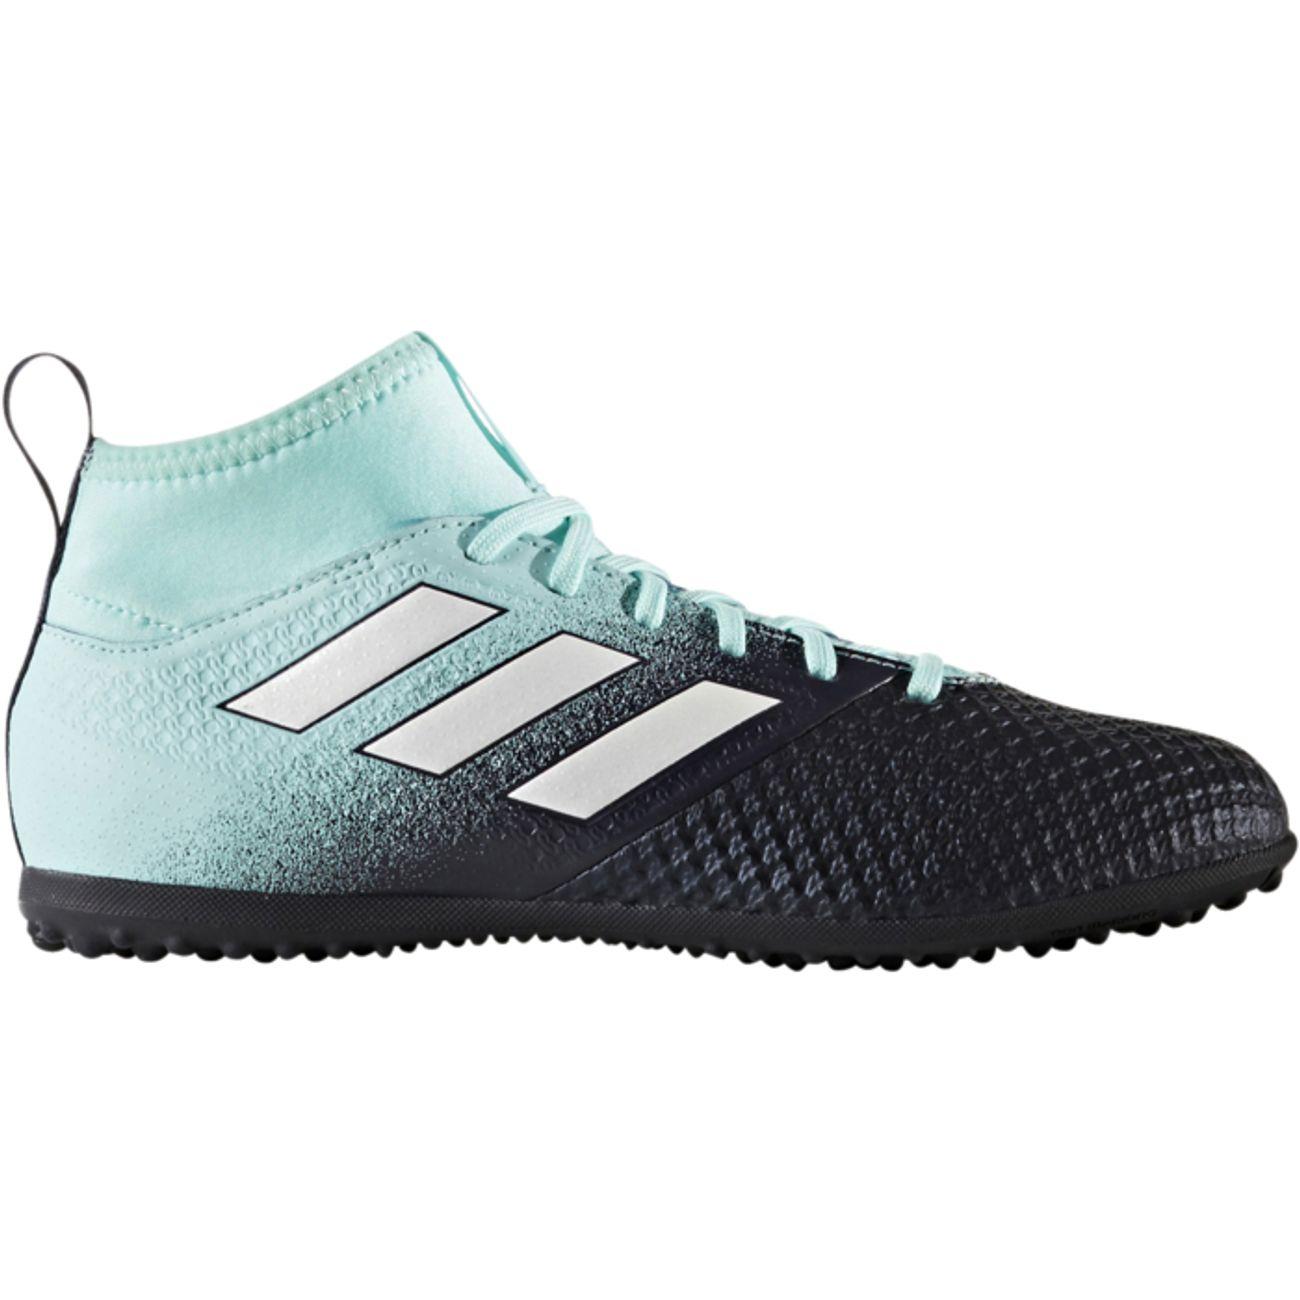 Adidas Chaussure ace tango 17.3 turf Bleu | Adidas Homme